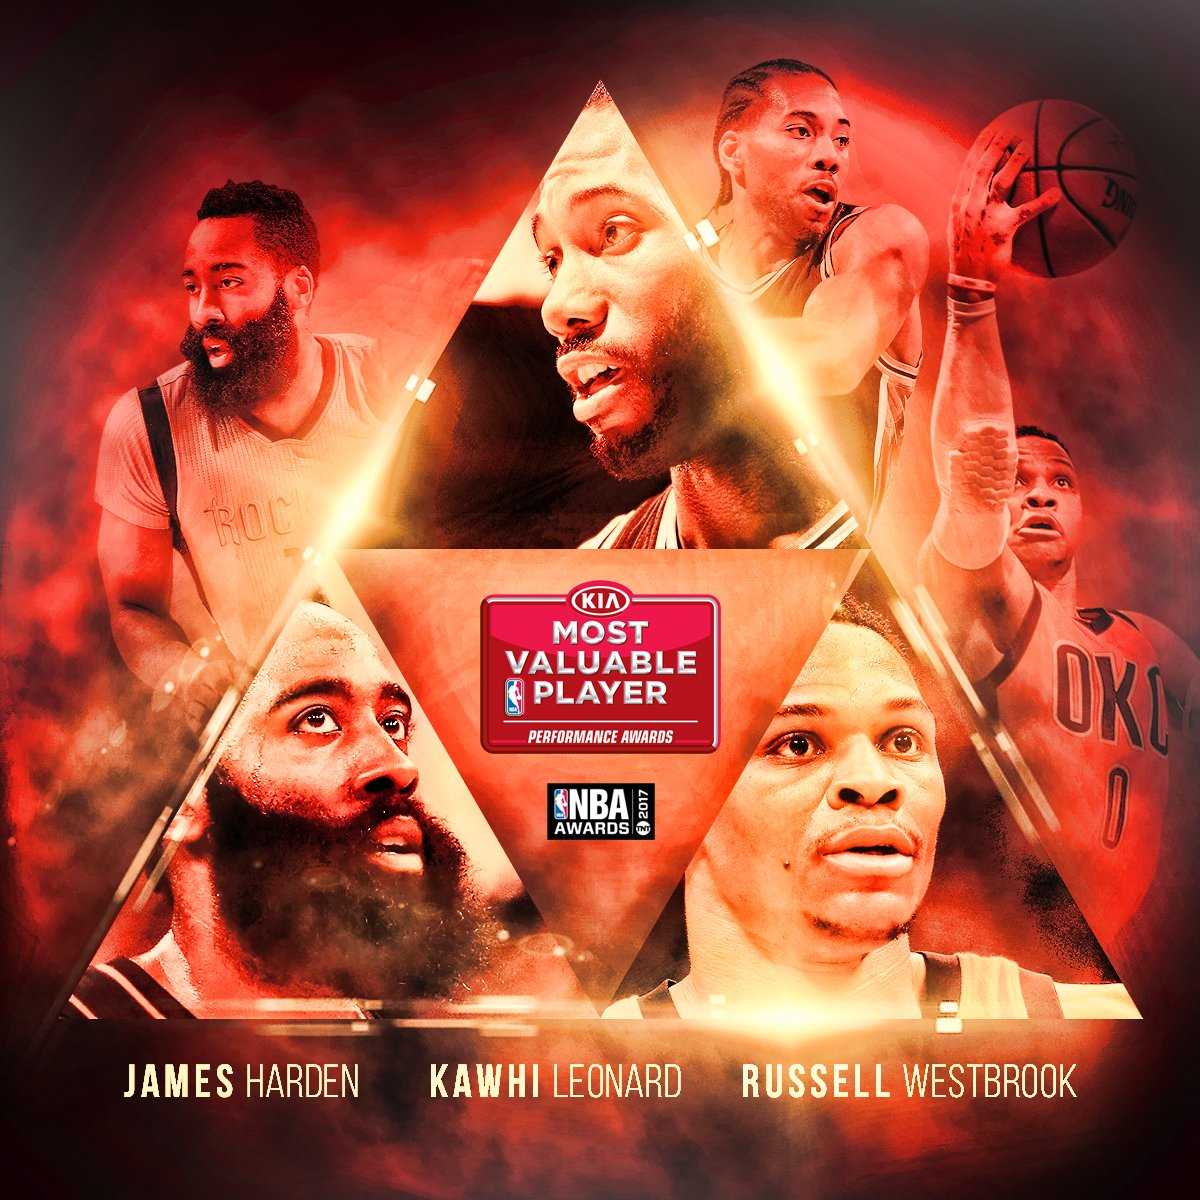 例行賽MVP最終候選人:James Harden、Russell Westbrook、Kawhi Leonard